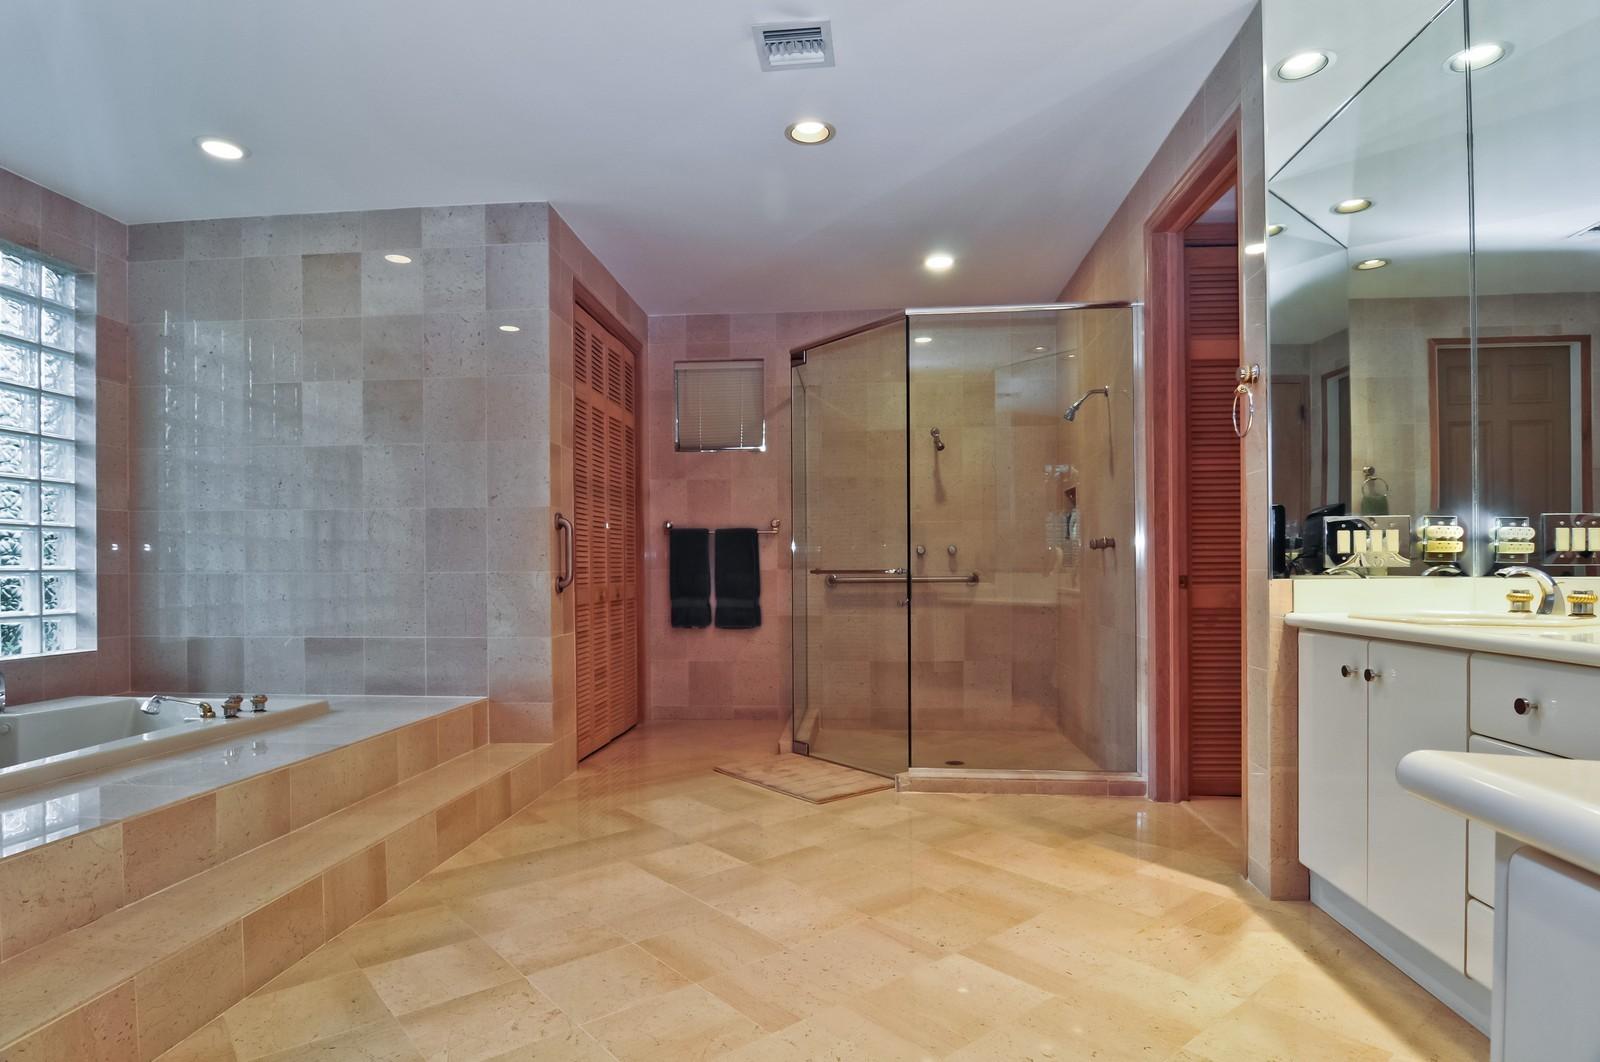 Real Estate Photography - 10701 SW 88th Ct, Miami, FL, 33176 - Master Bathroom